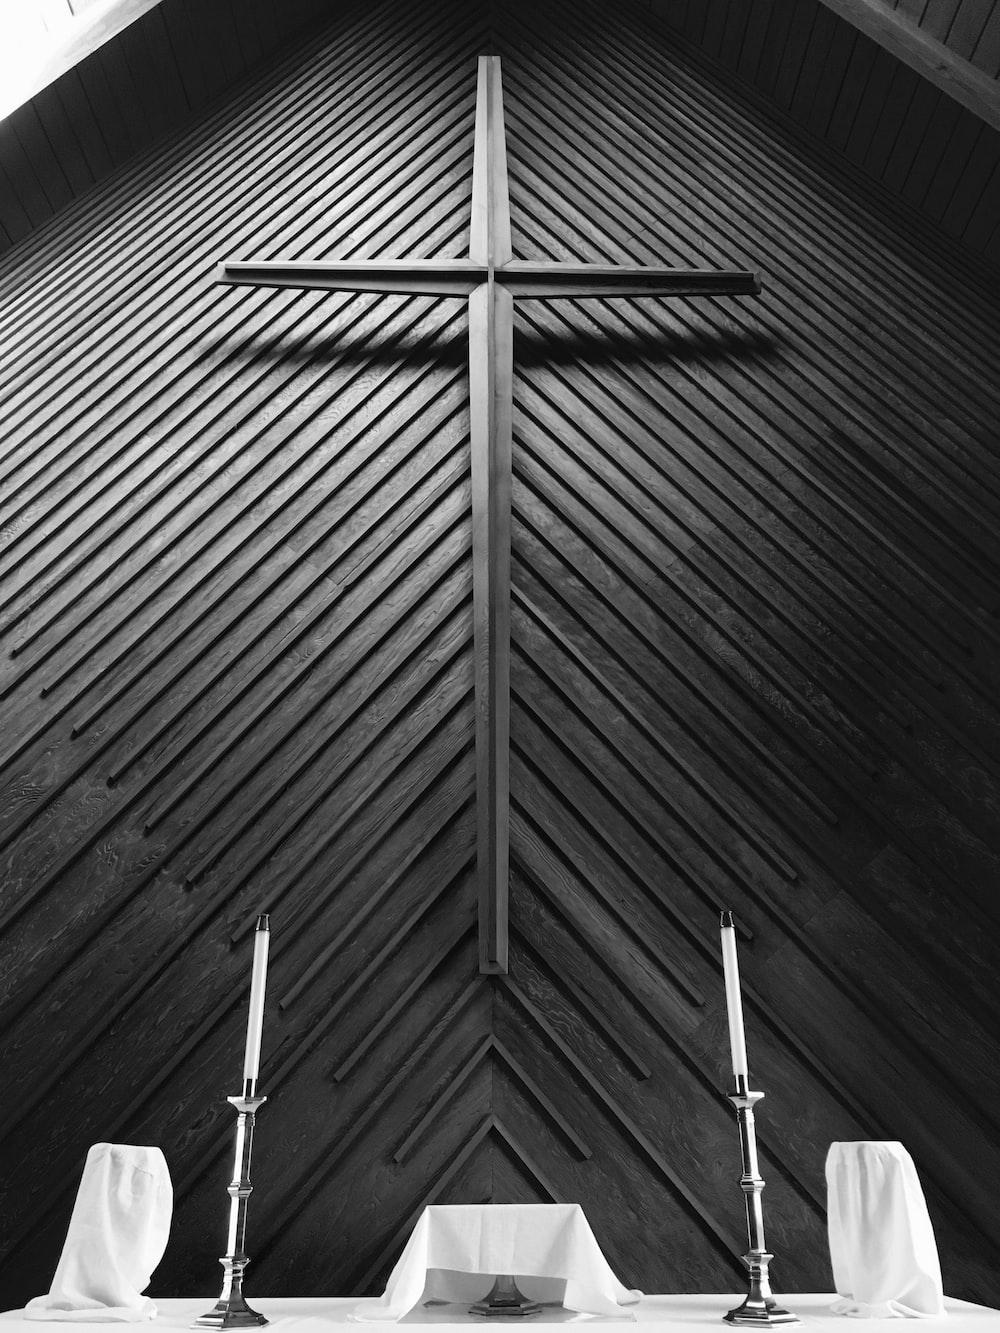 Church altar with black cross on wall